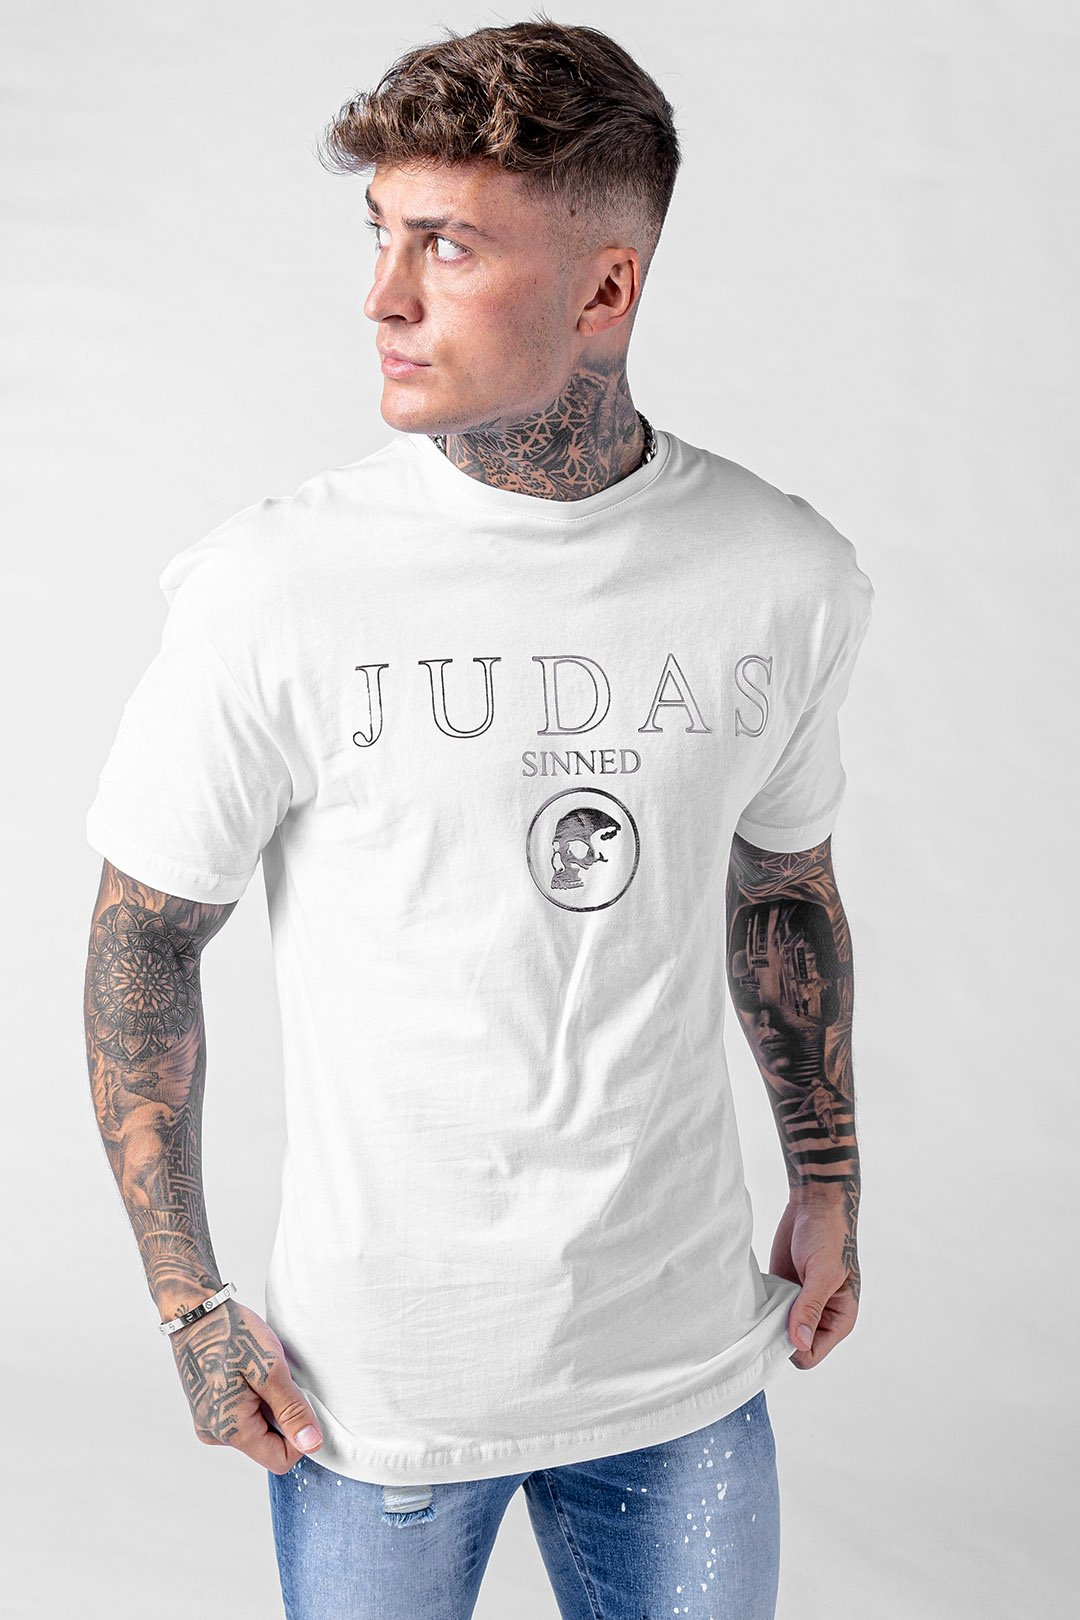 Rue Mirror Print Skull T-Shirt - White, Small